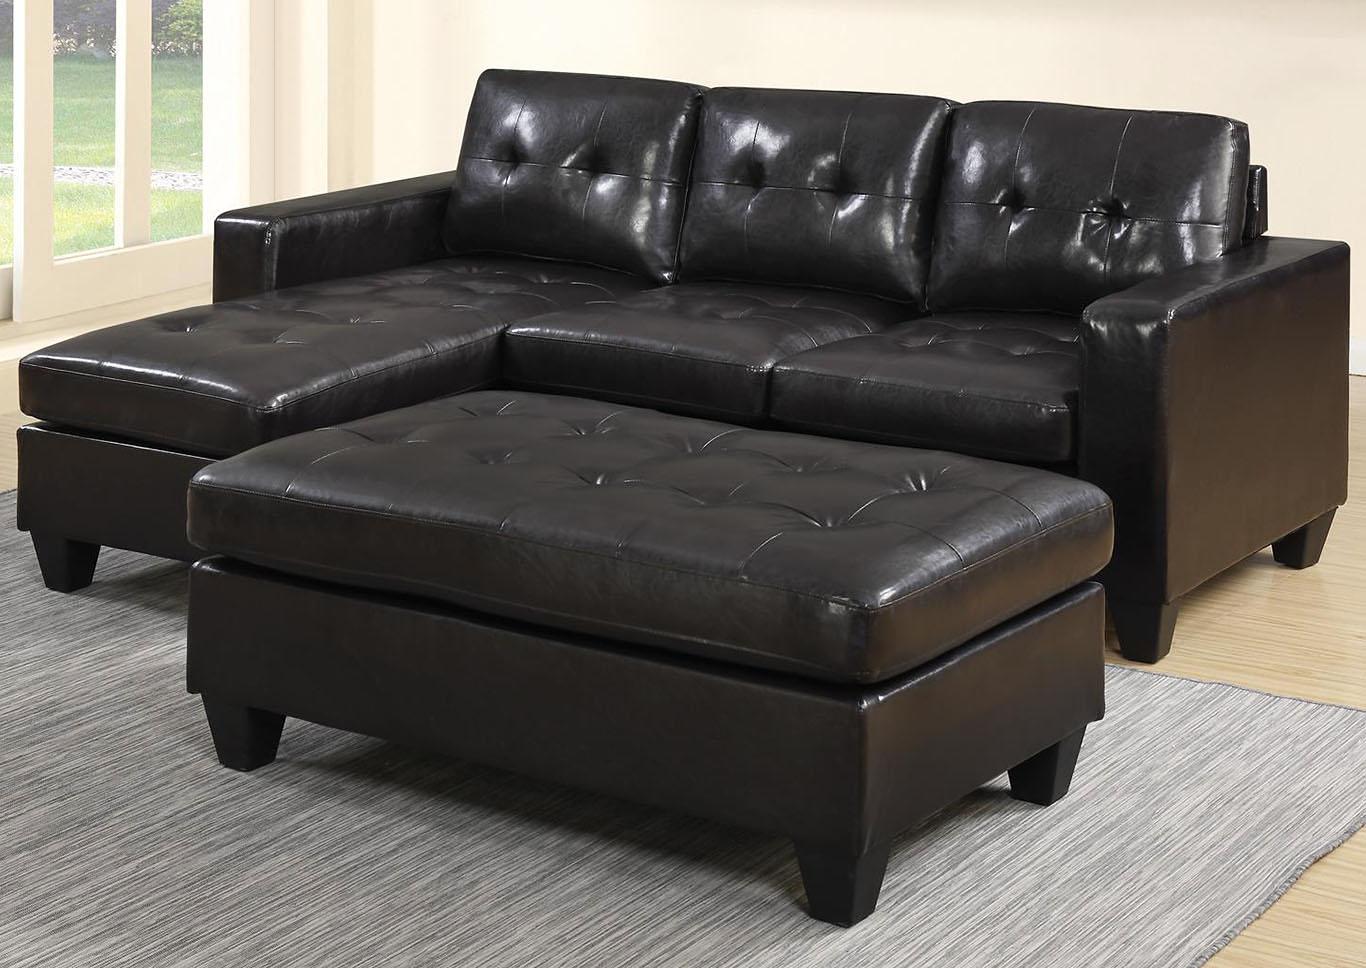 Pleasing Roses Flooring And Furniture Norwalk Black Sofa W Ottoman Forskolin Free Trial Chair Design Images Forskolin Free Trialorg